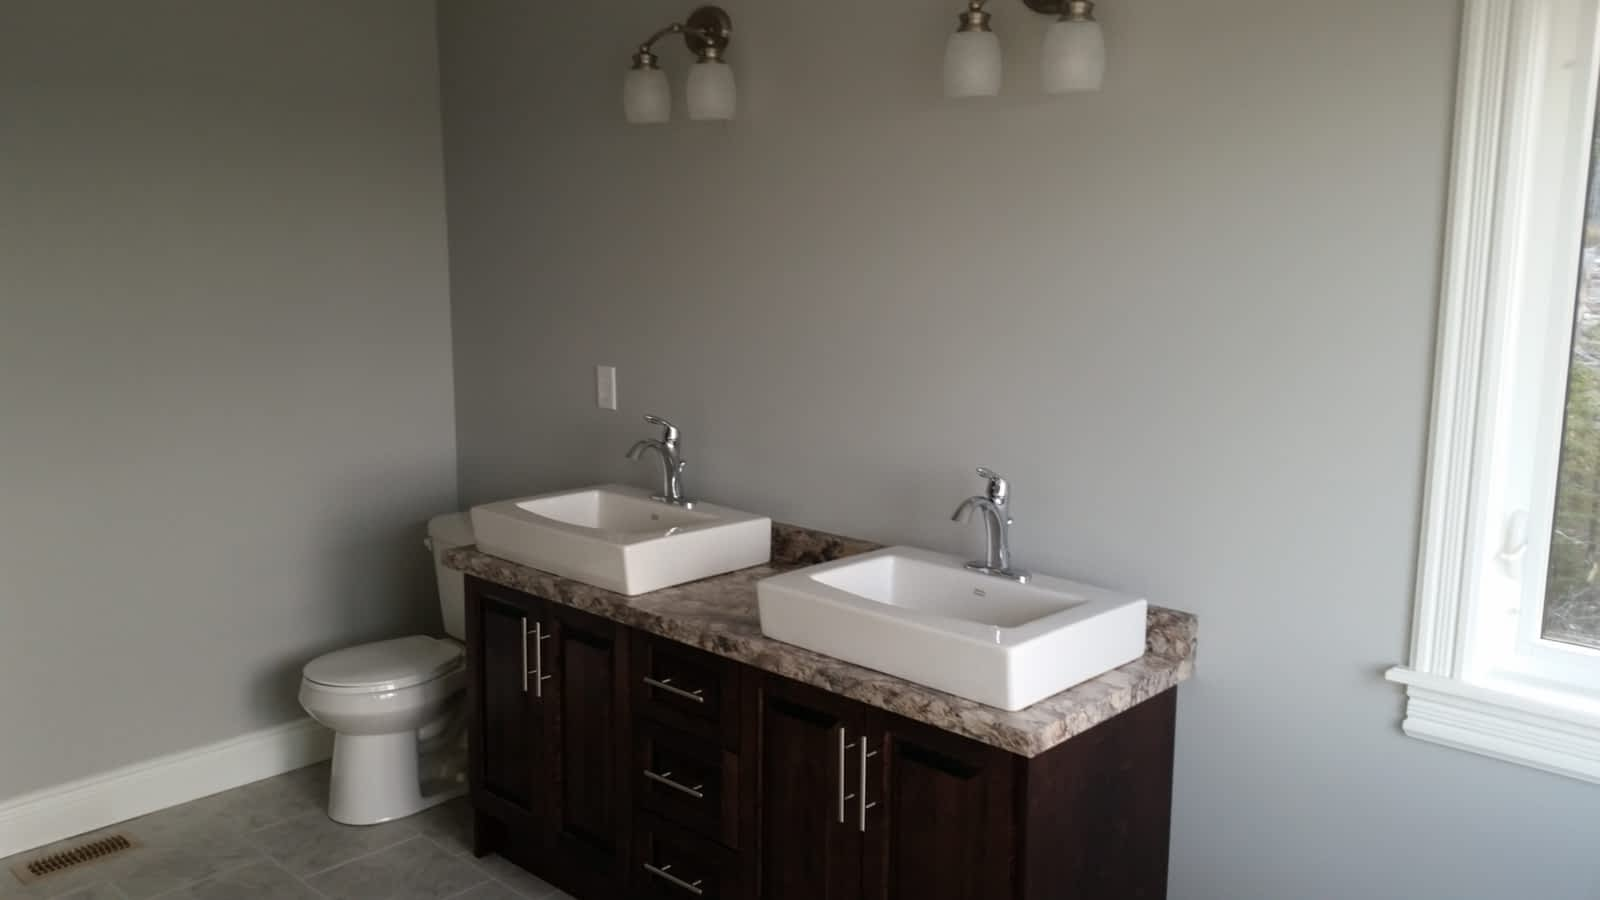 west seesite north plumber biz ltd plumbing burnley bathrooms in heating plumbingandheating the and